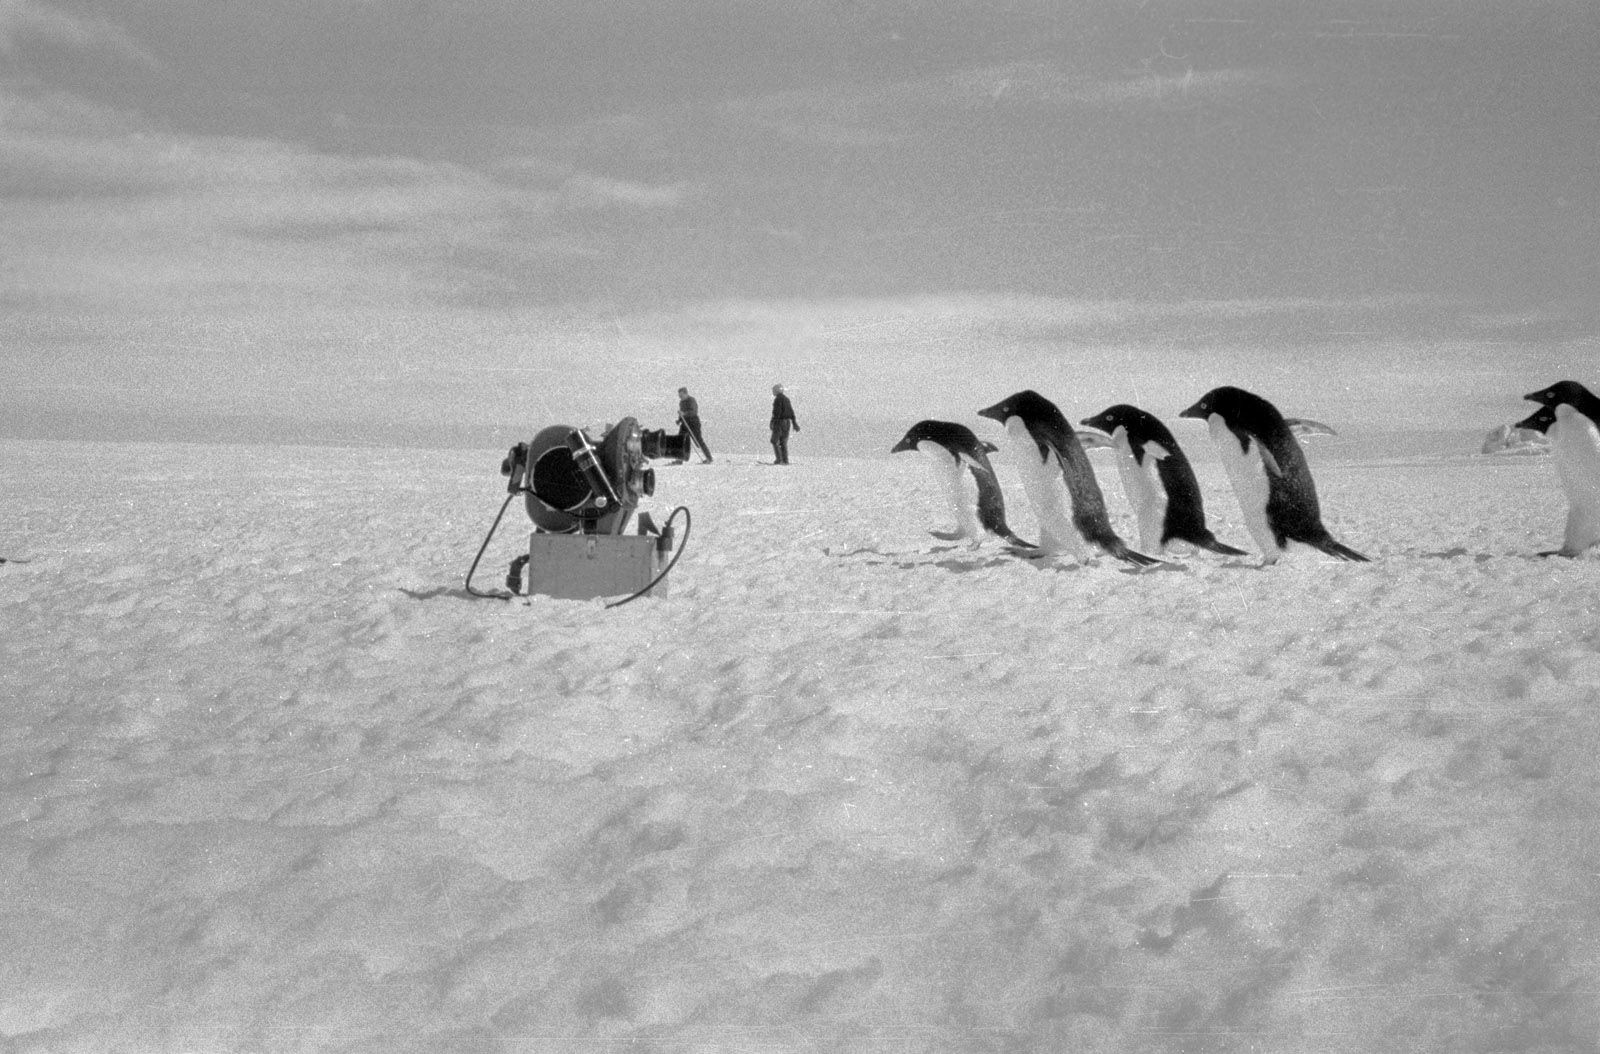 Экспонат #159. Антарктида (1961 — 1962)